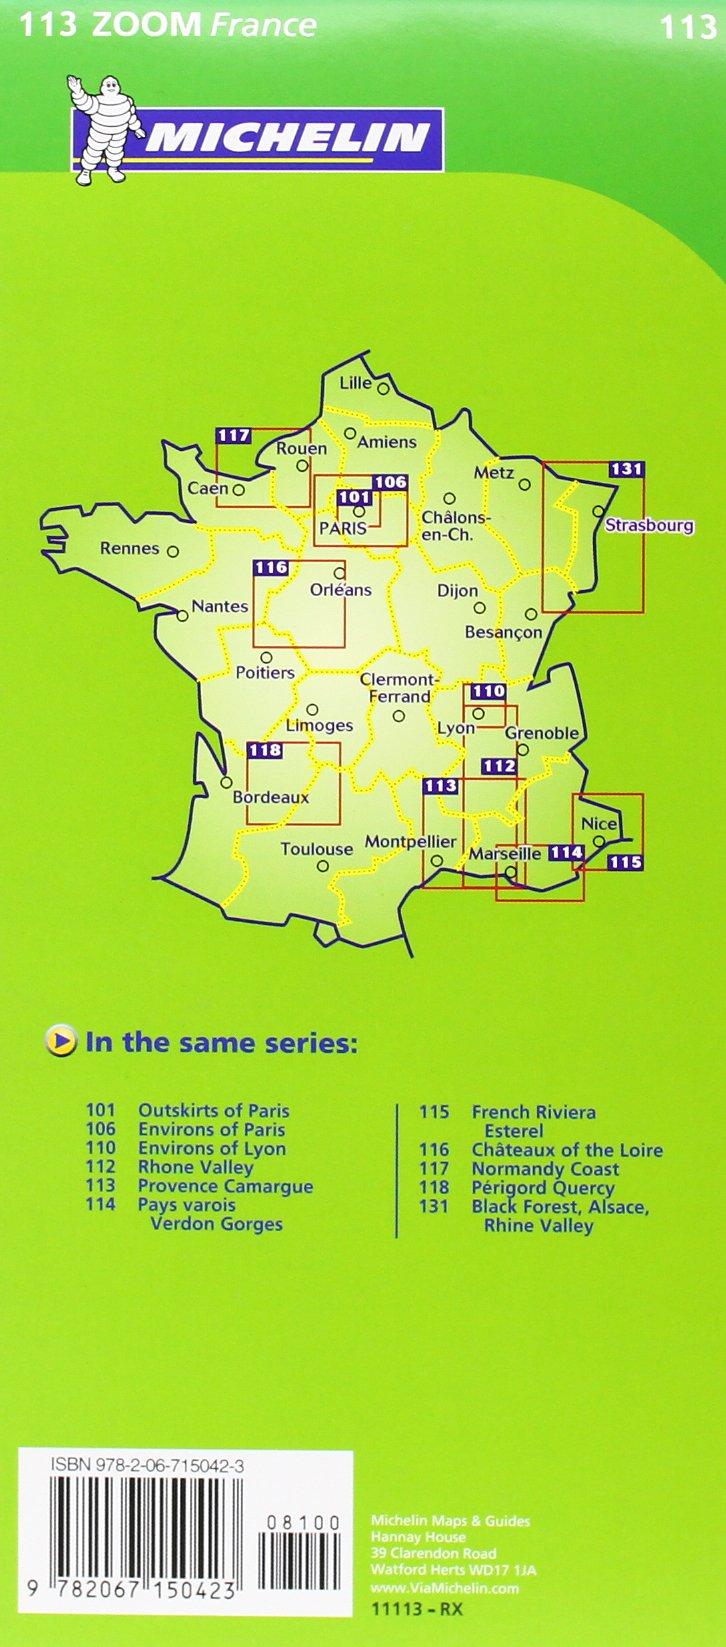 Camargue Karte.Mapa Zoom Provence Camargue Mapas Zoom Michelin Band 113 Amazon